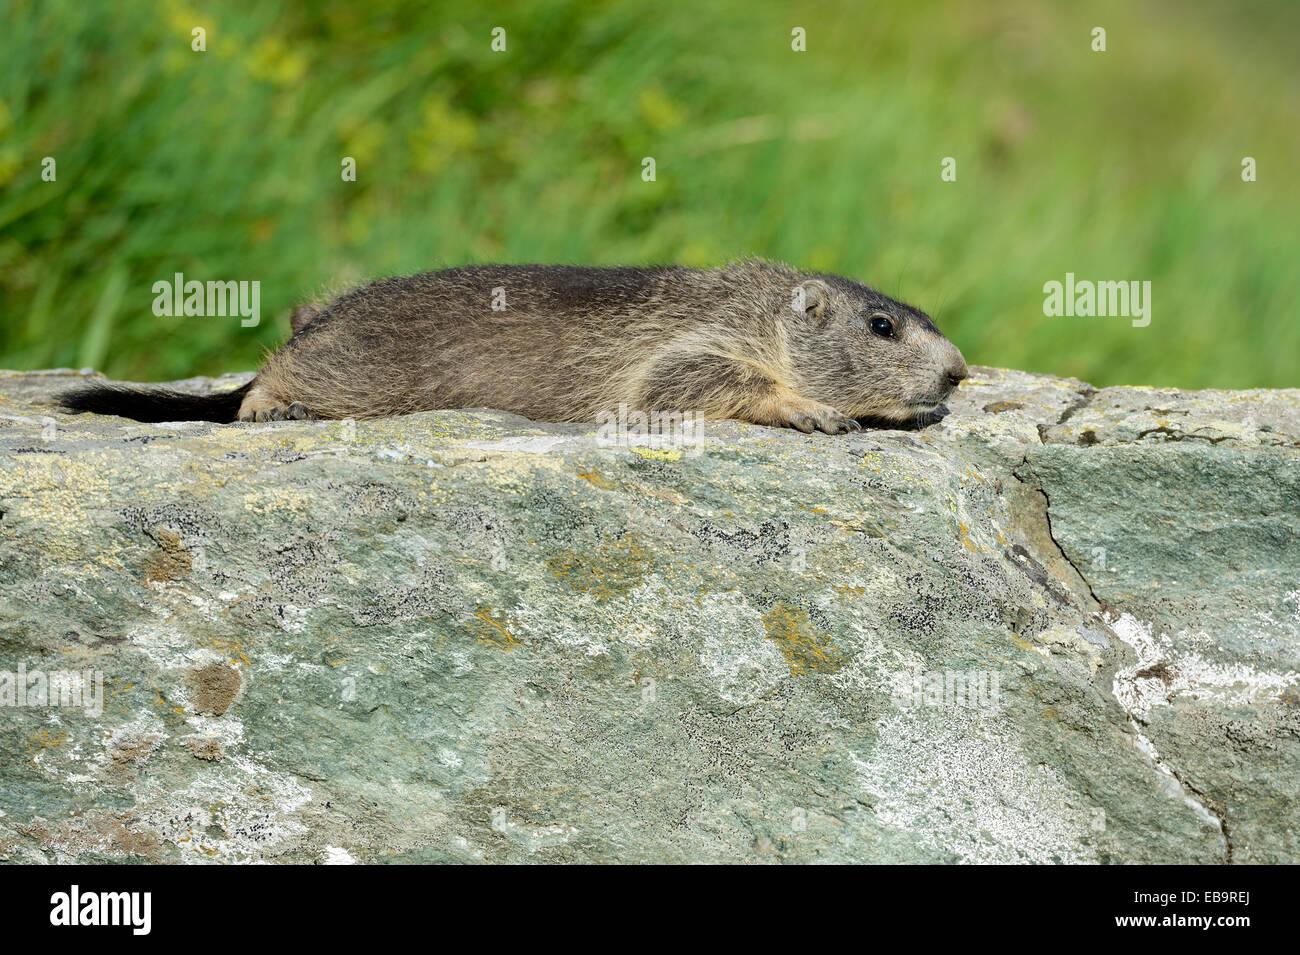 Young Alpine Marmot (Marmota marmota) basking on a rock slab, Grossglockner, Hohe Tauern National Park, Tyrol, Austria - Stock Image